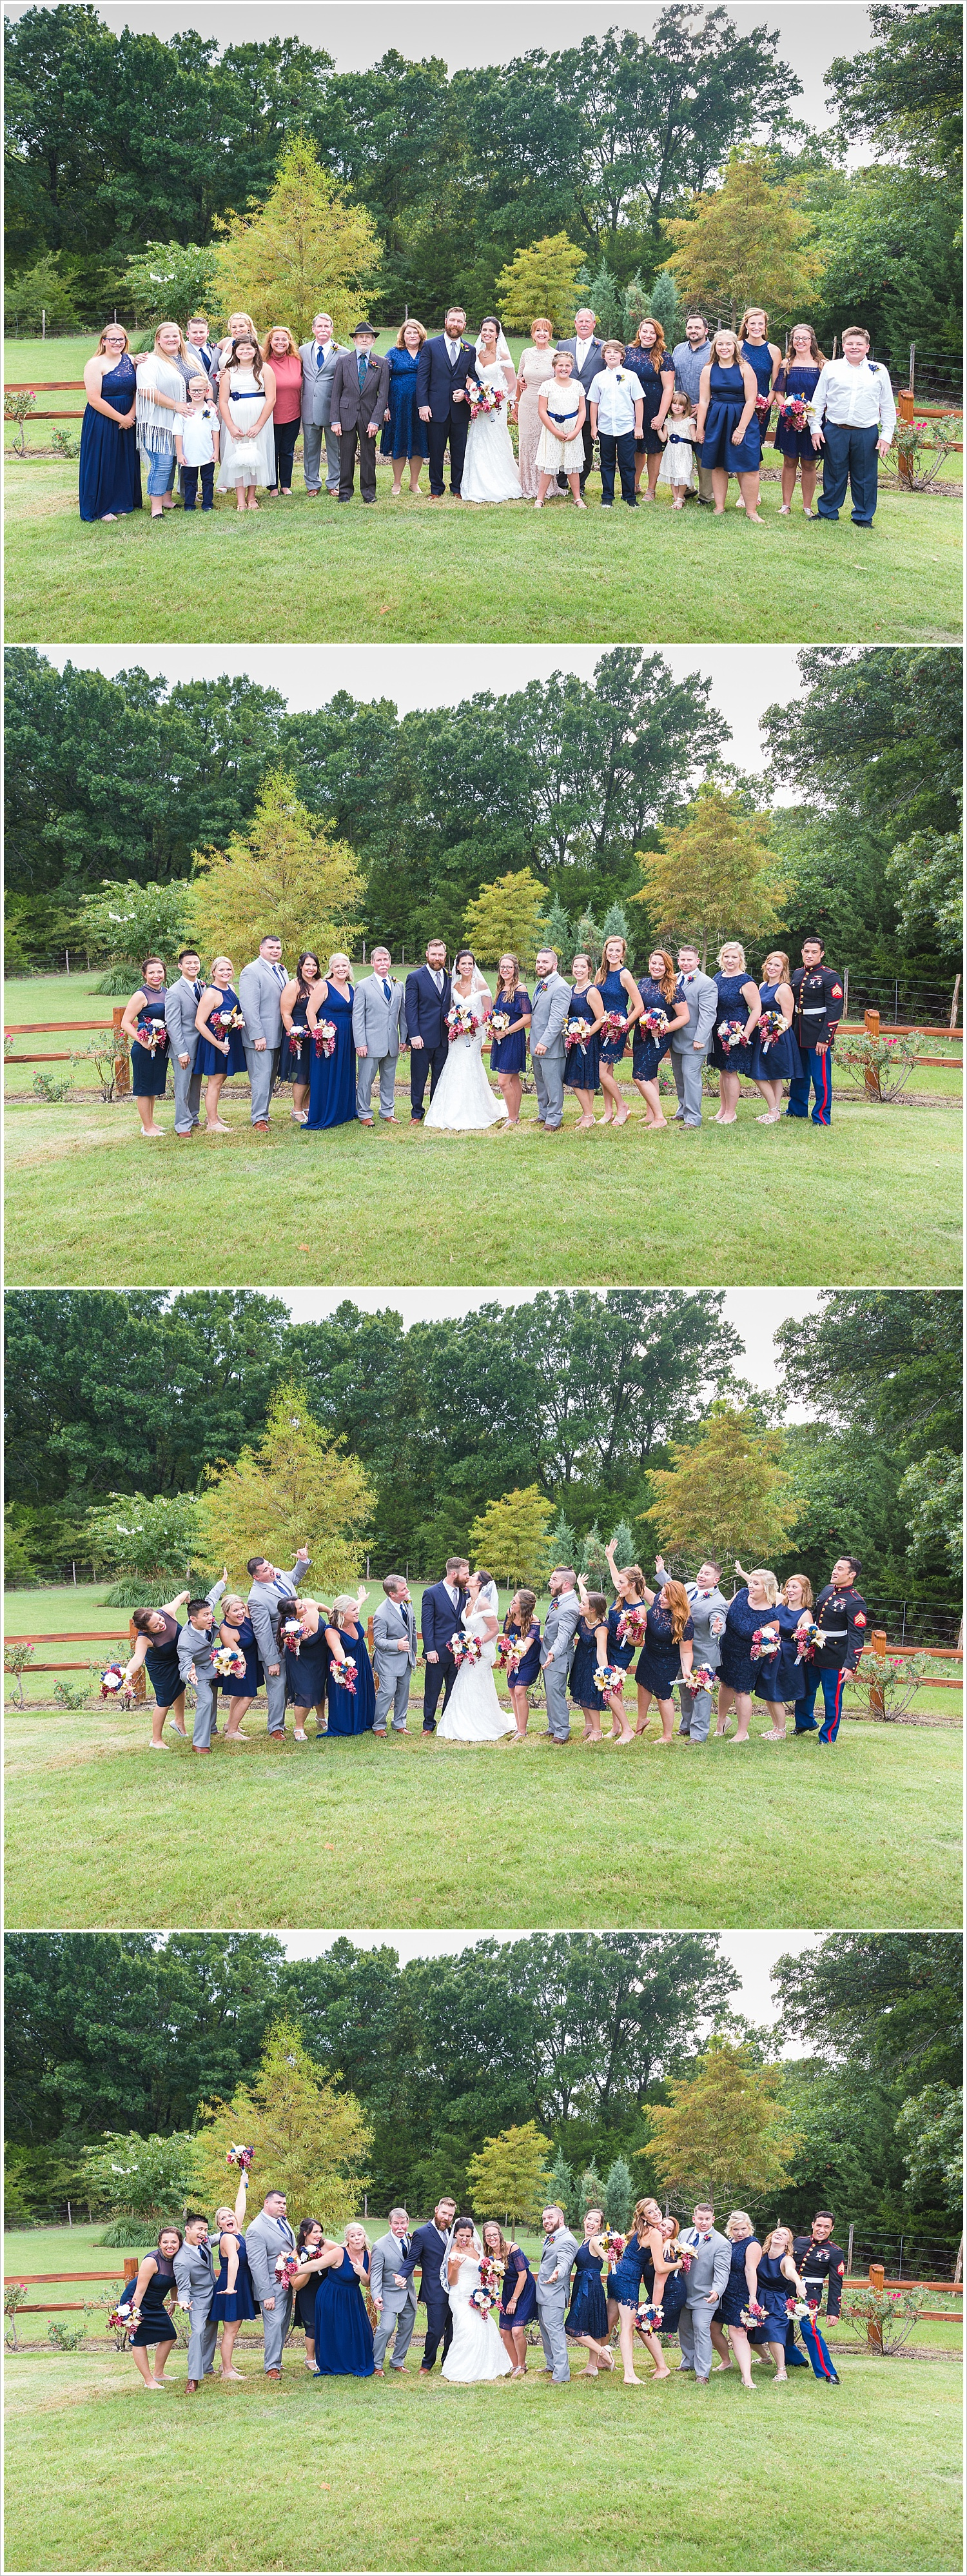 Bridal party portrait,summer blush and navy wedding at Stone Hall at The Springs in McKinney, Texas, Jason & Melaina Photography, www.jasonandmelaina.com